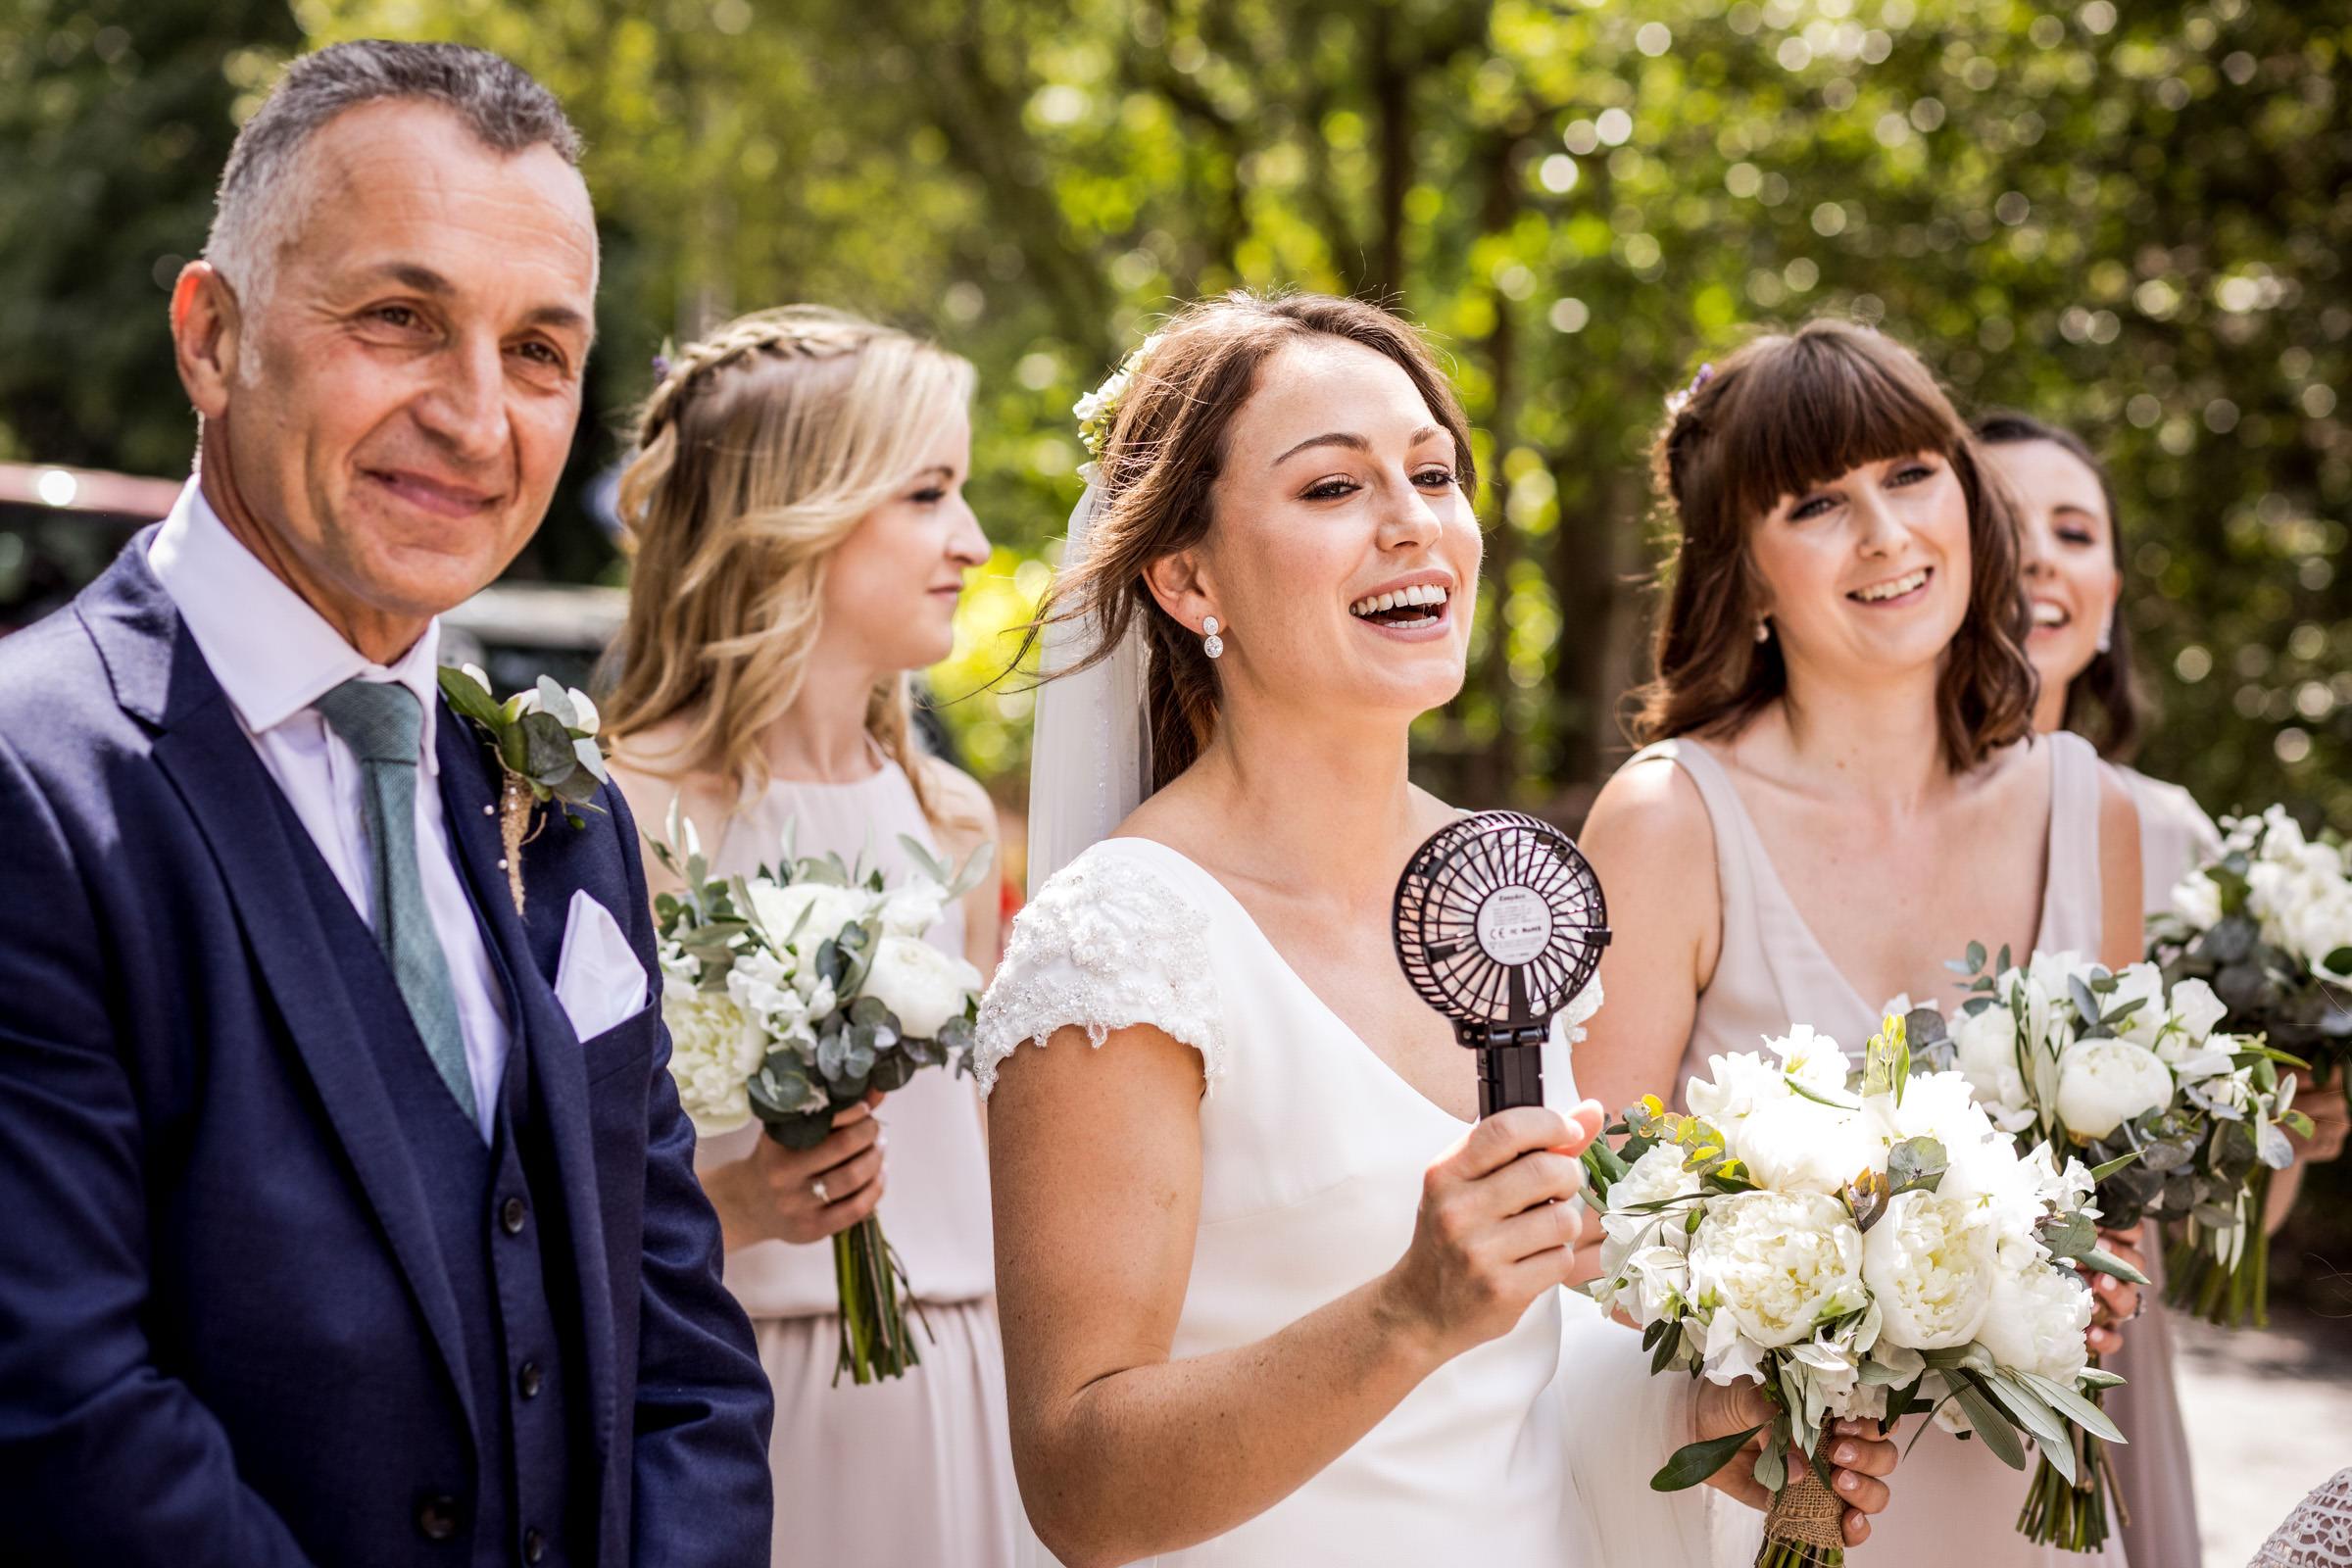 Wedding Photography in Ewshot Surrey 008.jpg